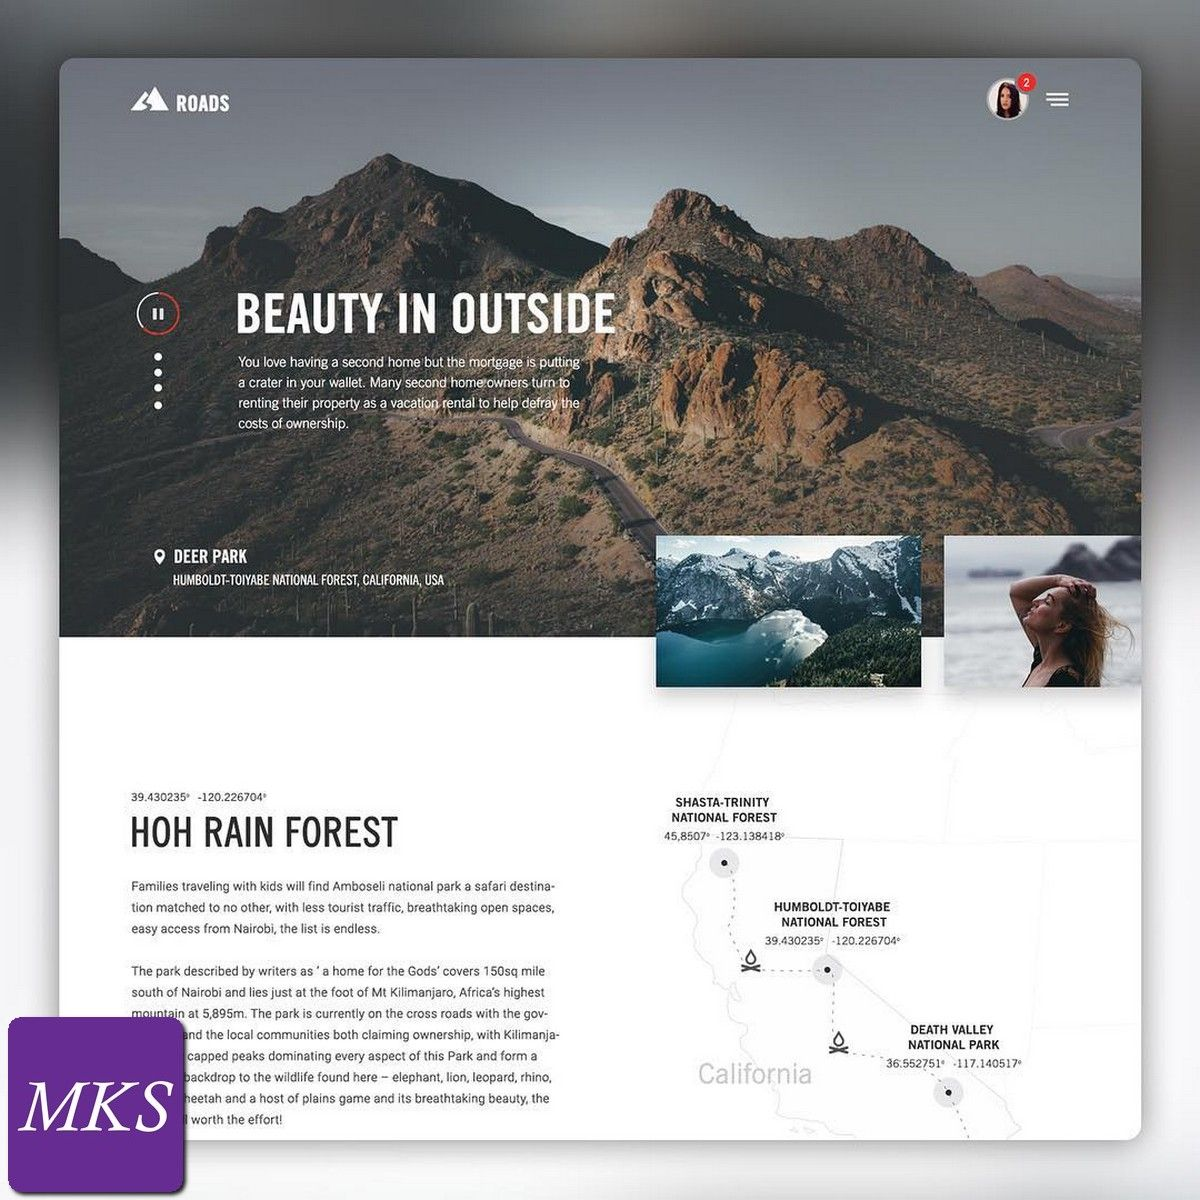 Visit Us For More Web Design Mks Web Design Mkswd Mkswebdesign Kansas Kstate Mks Mhk Manhattanka Web Design Web Design Help Custom Website Design